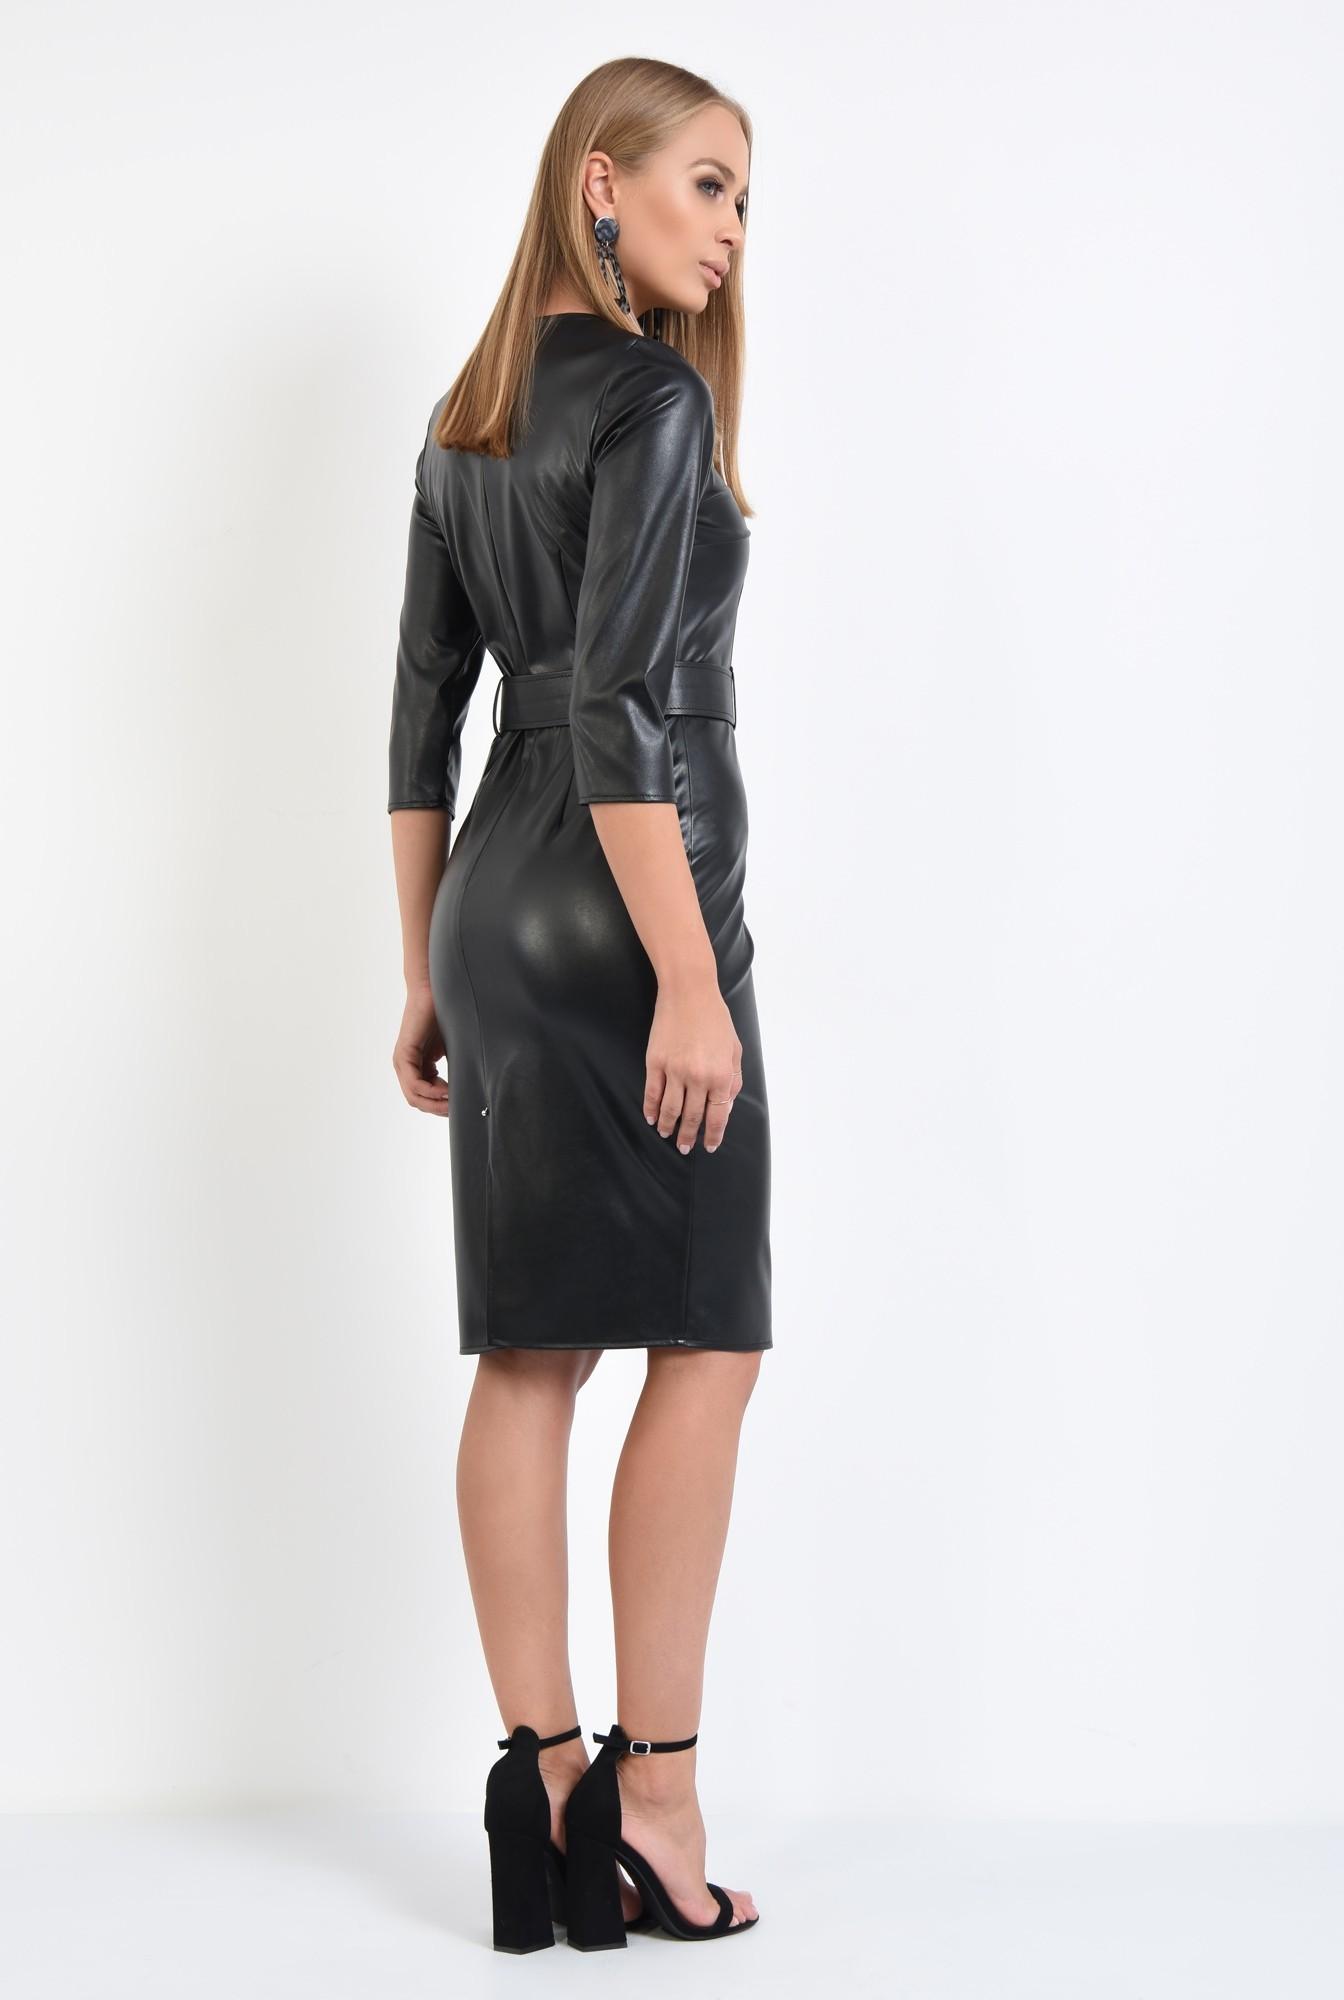 1 - rochie de toamna, neagra, croi conic, cu centura